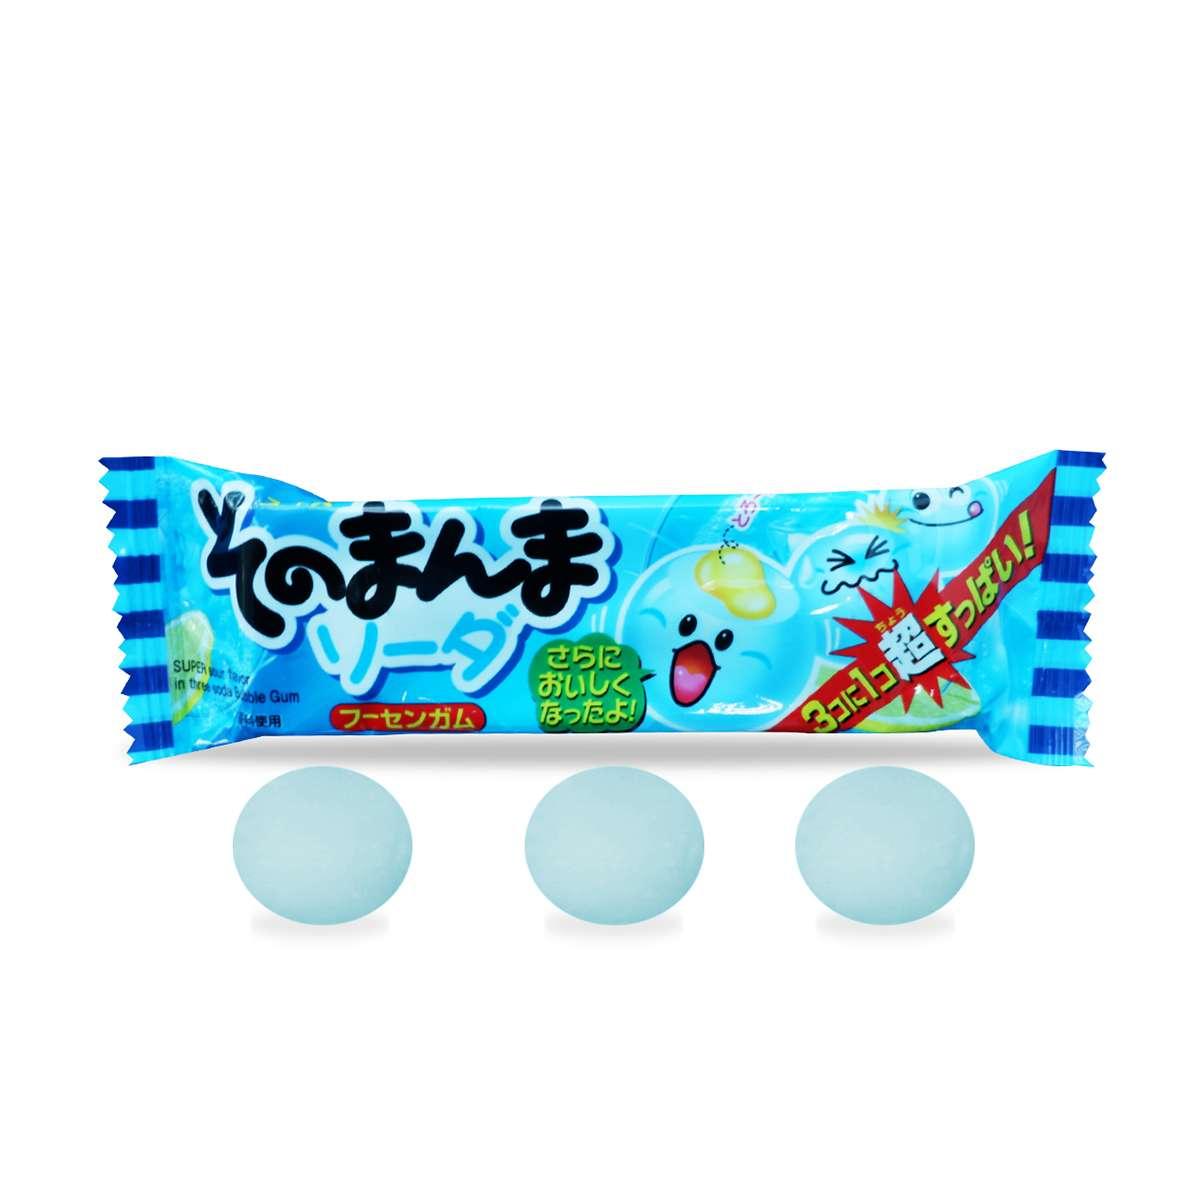 Kẹo cao su hương soda Nhật Bản